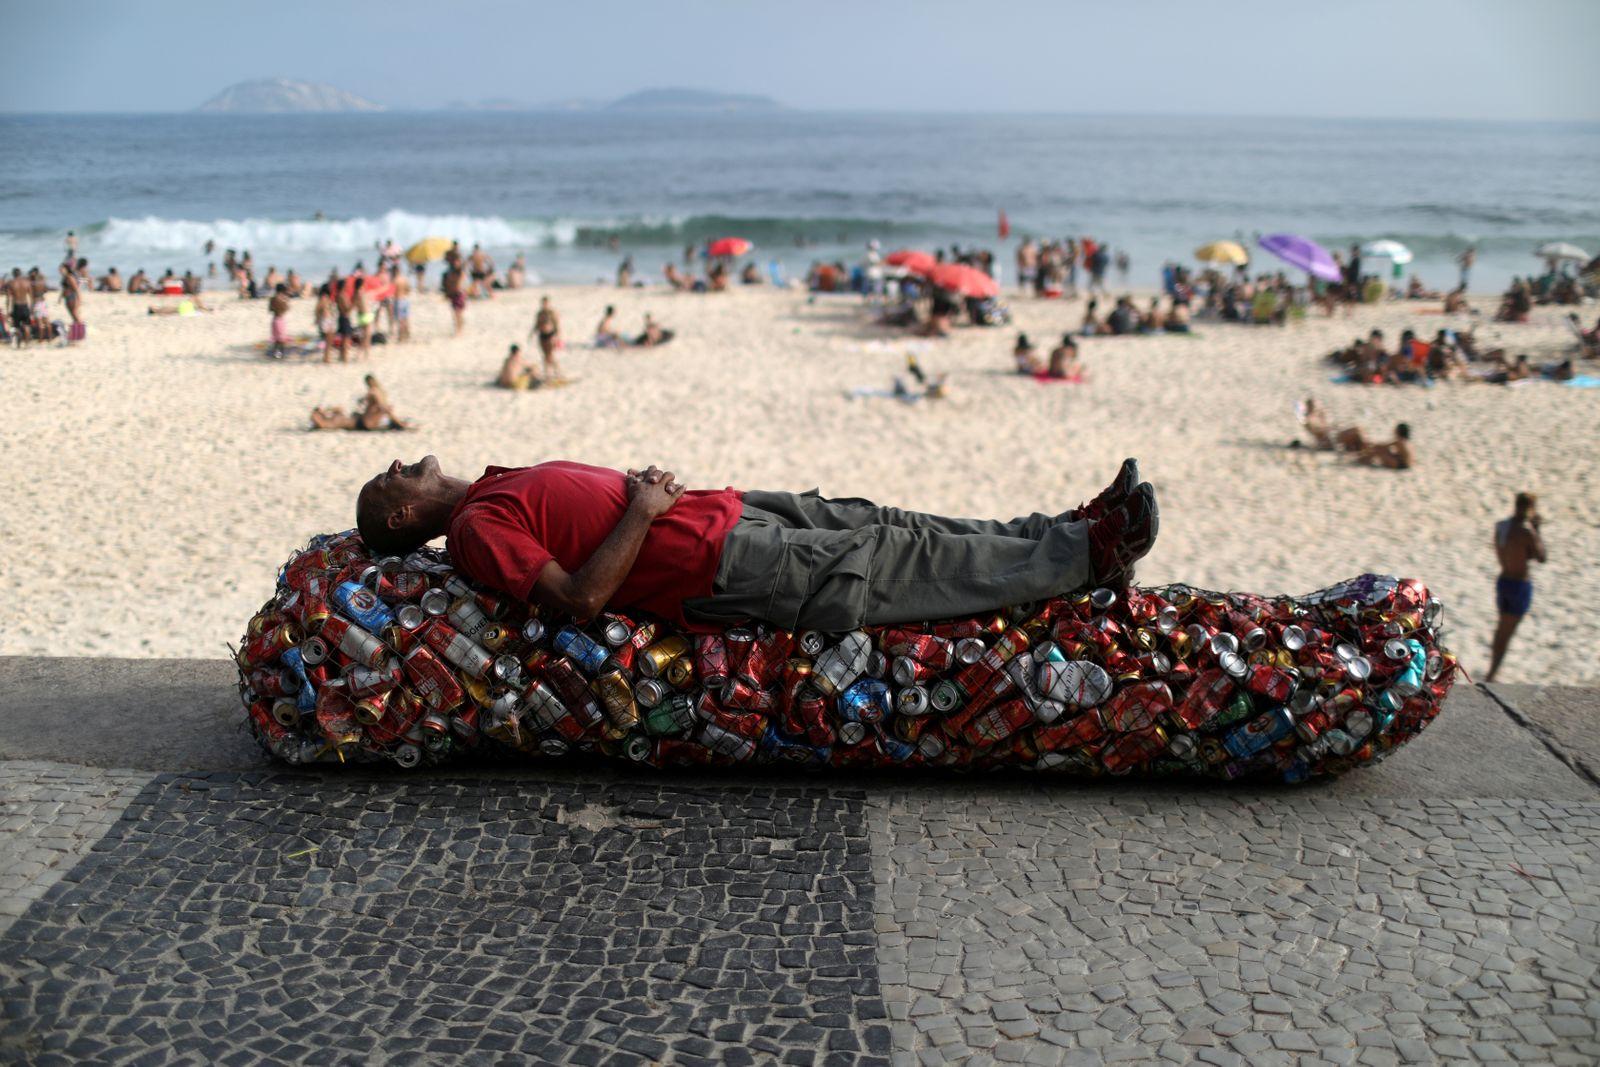 The coronavirus disease (COVID-19) outbreak in Rio de Janeiro